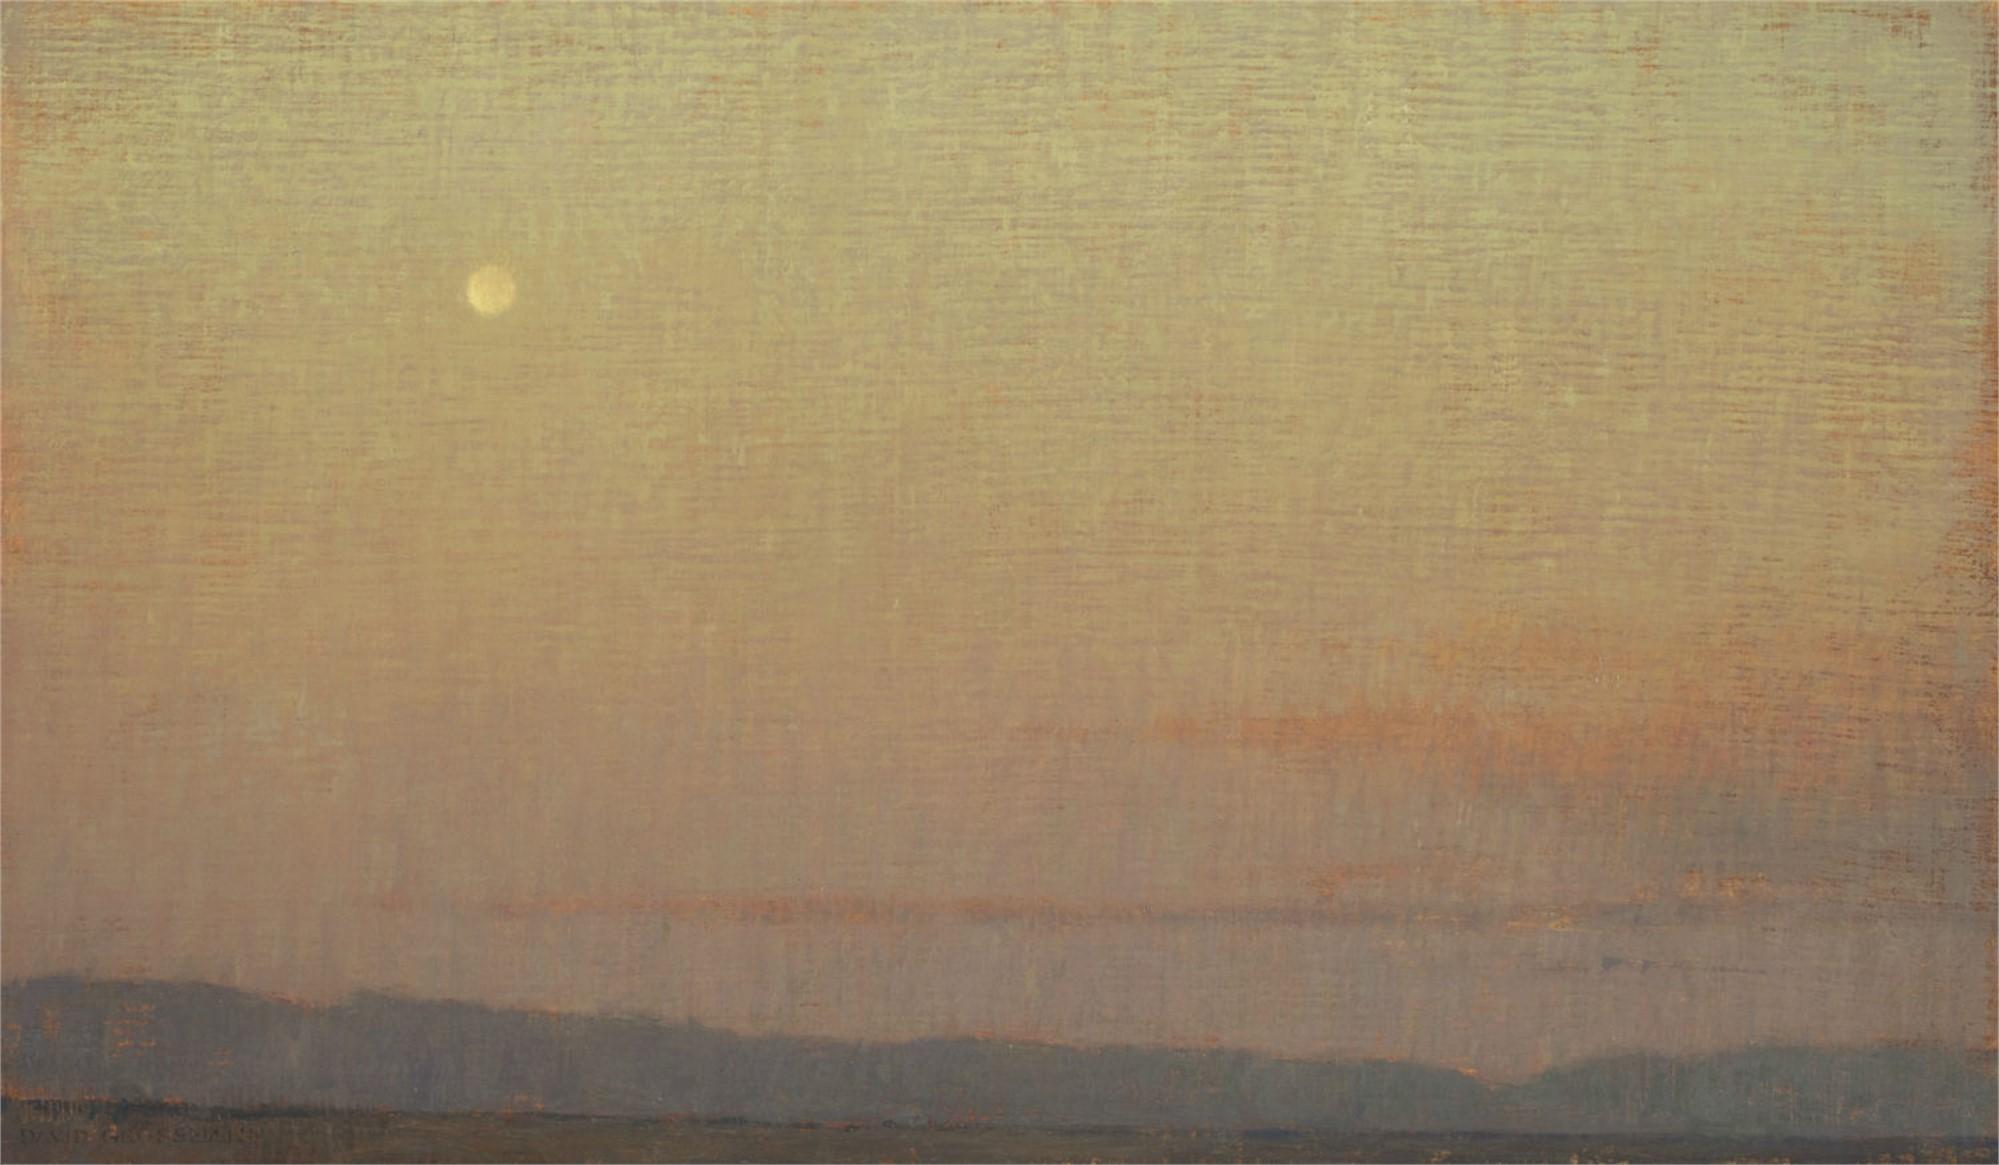 Opal Morning Sky by David Grossmann